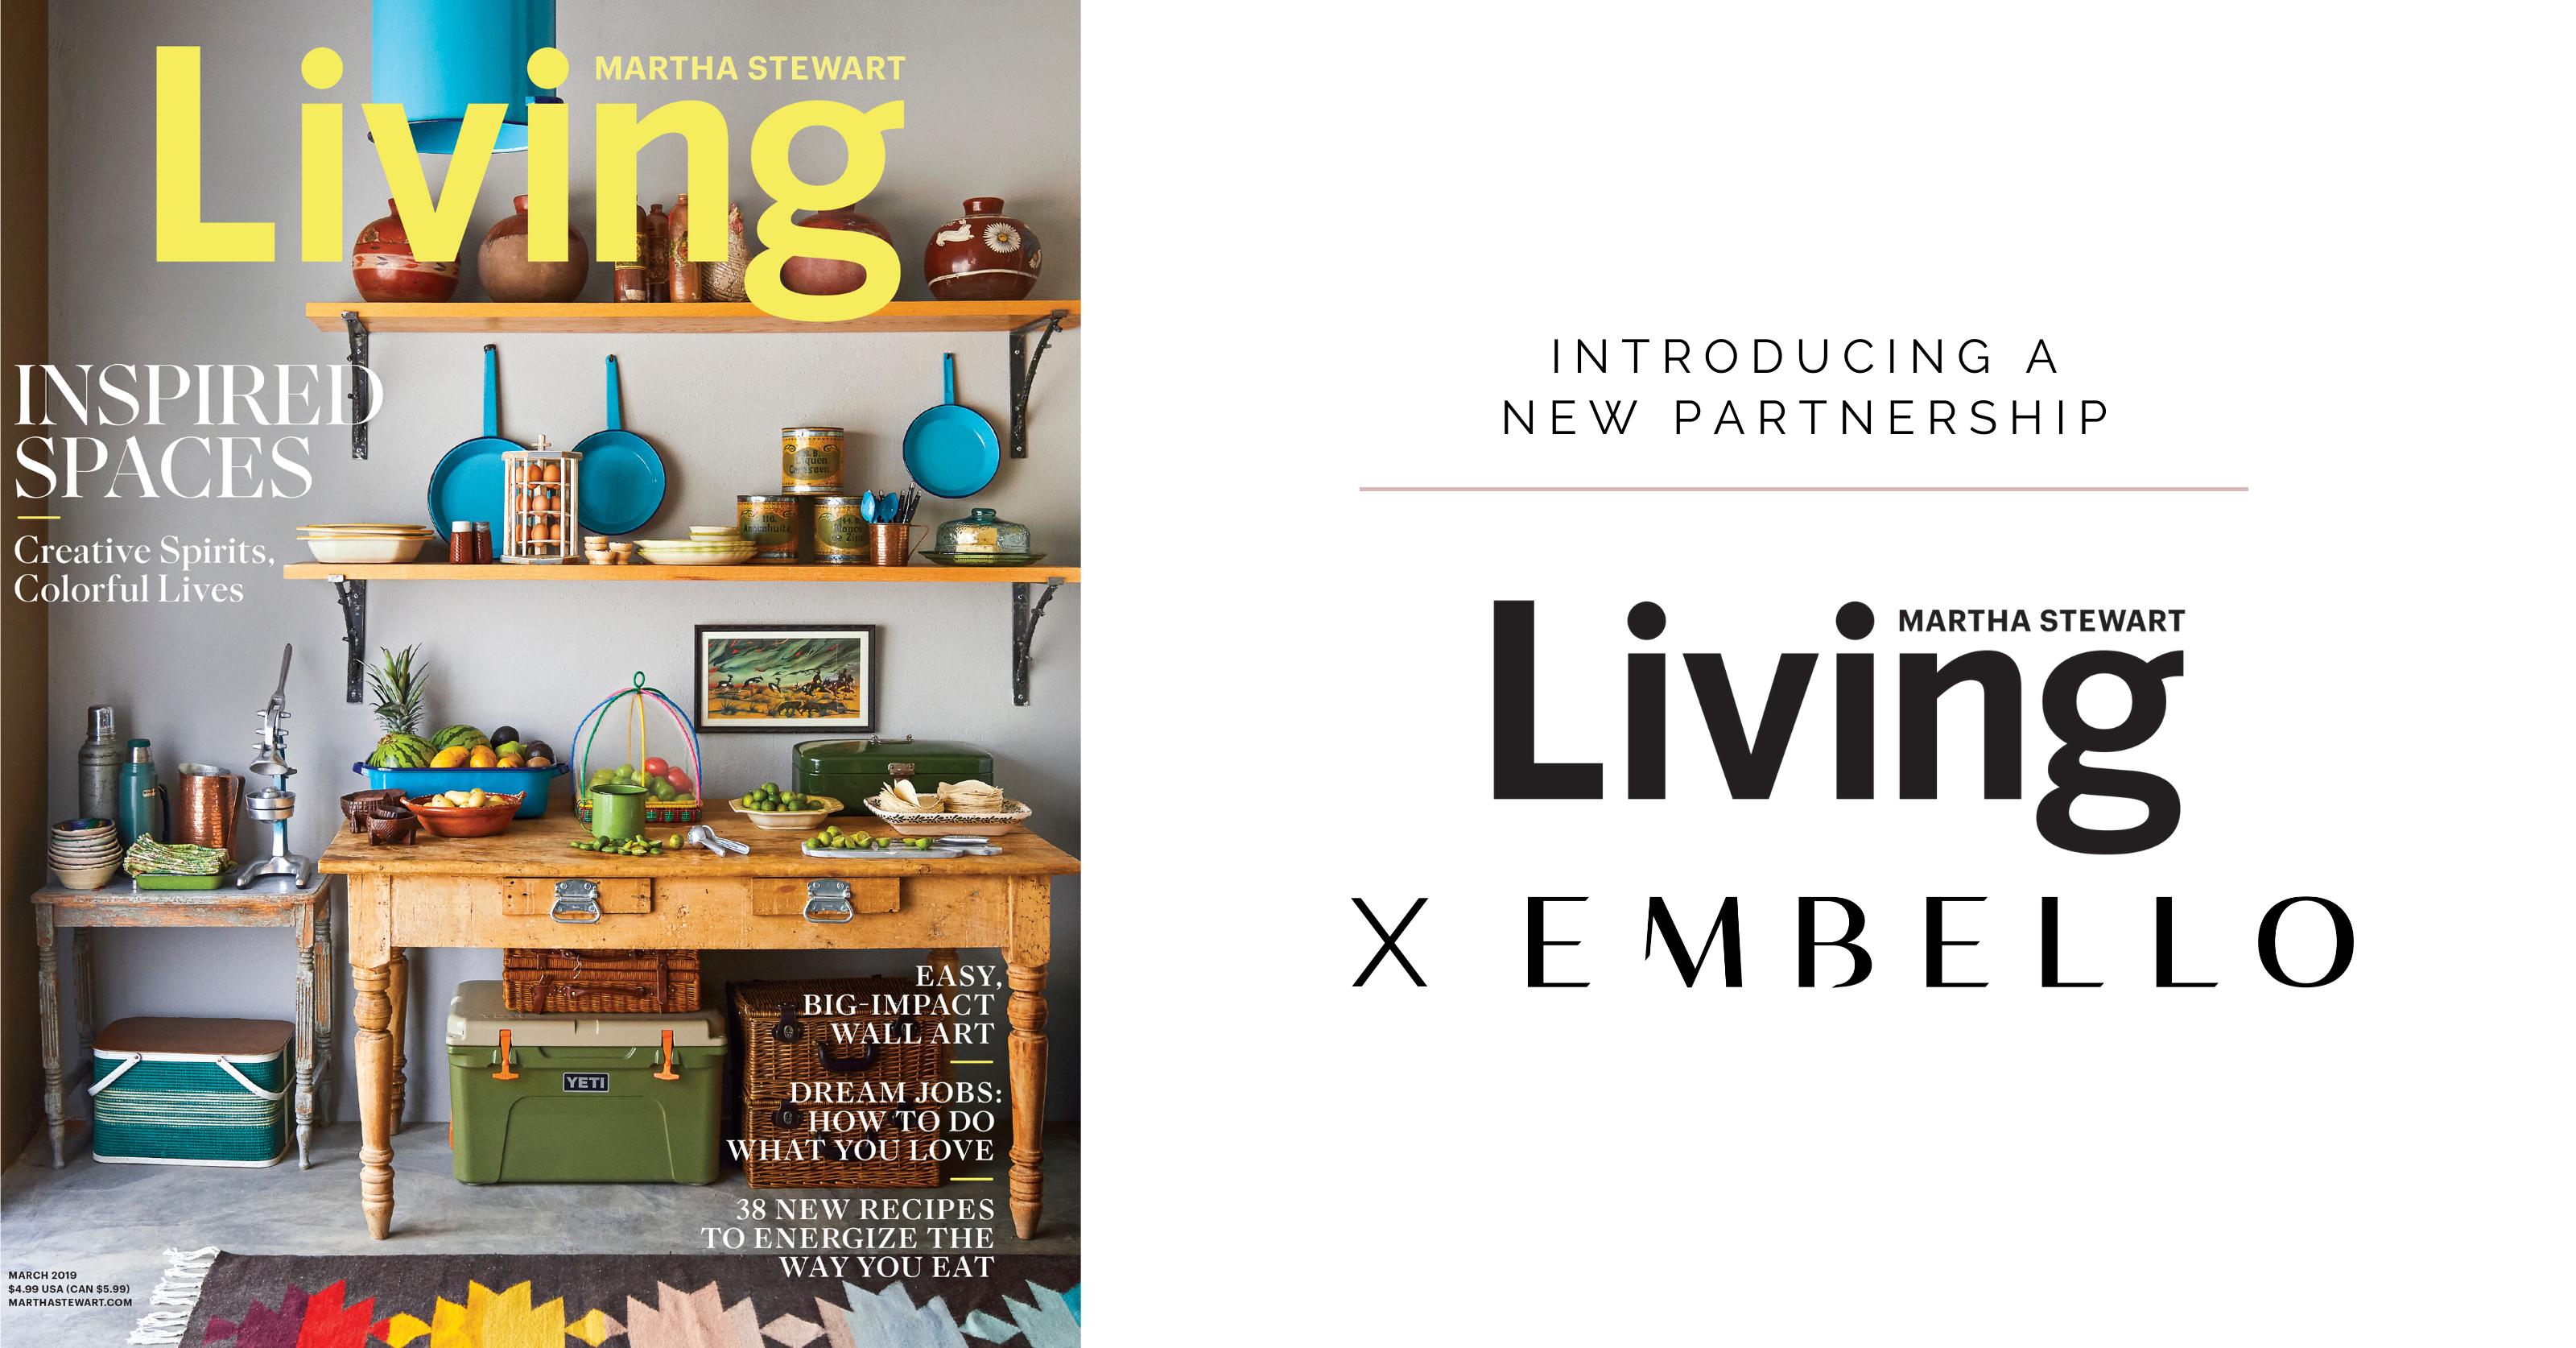 Martha Stewart Living Embello Partnership